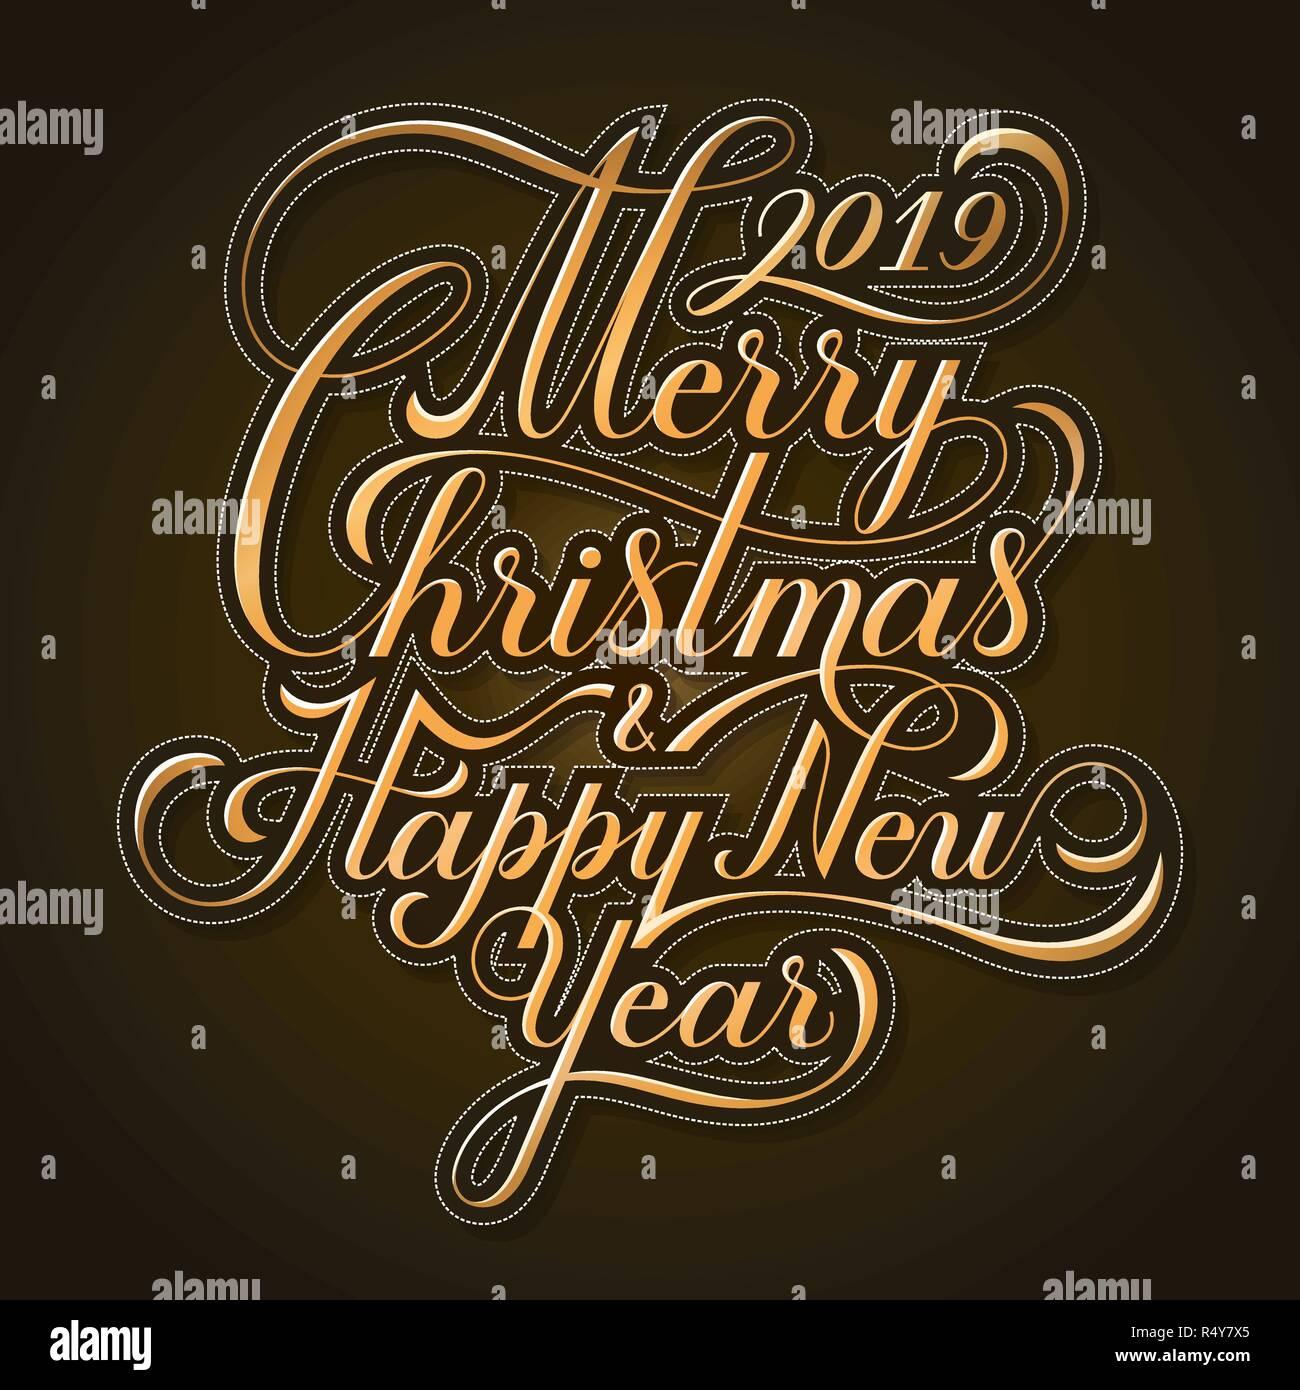 Happy New Year Text Stockfotos & Happy New Year Text Bilder - Alamy